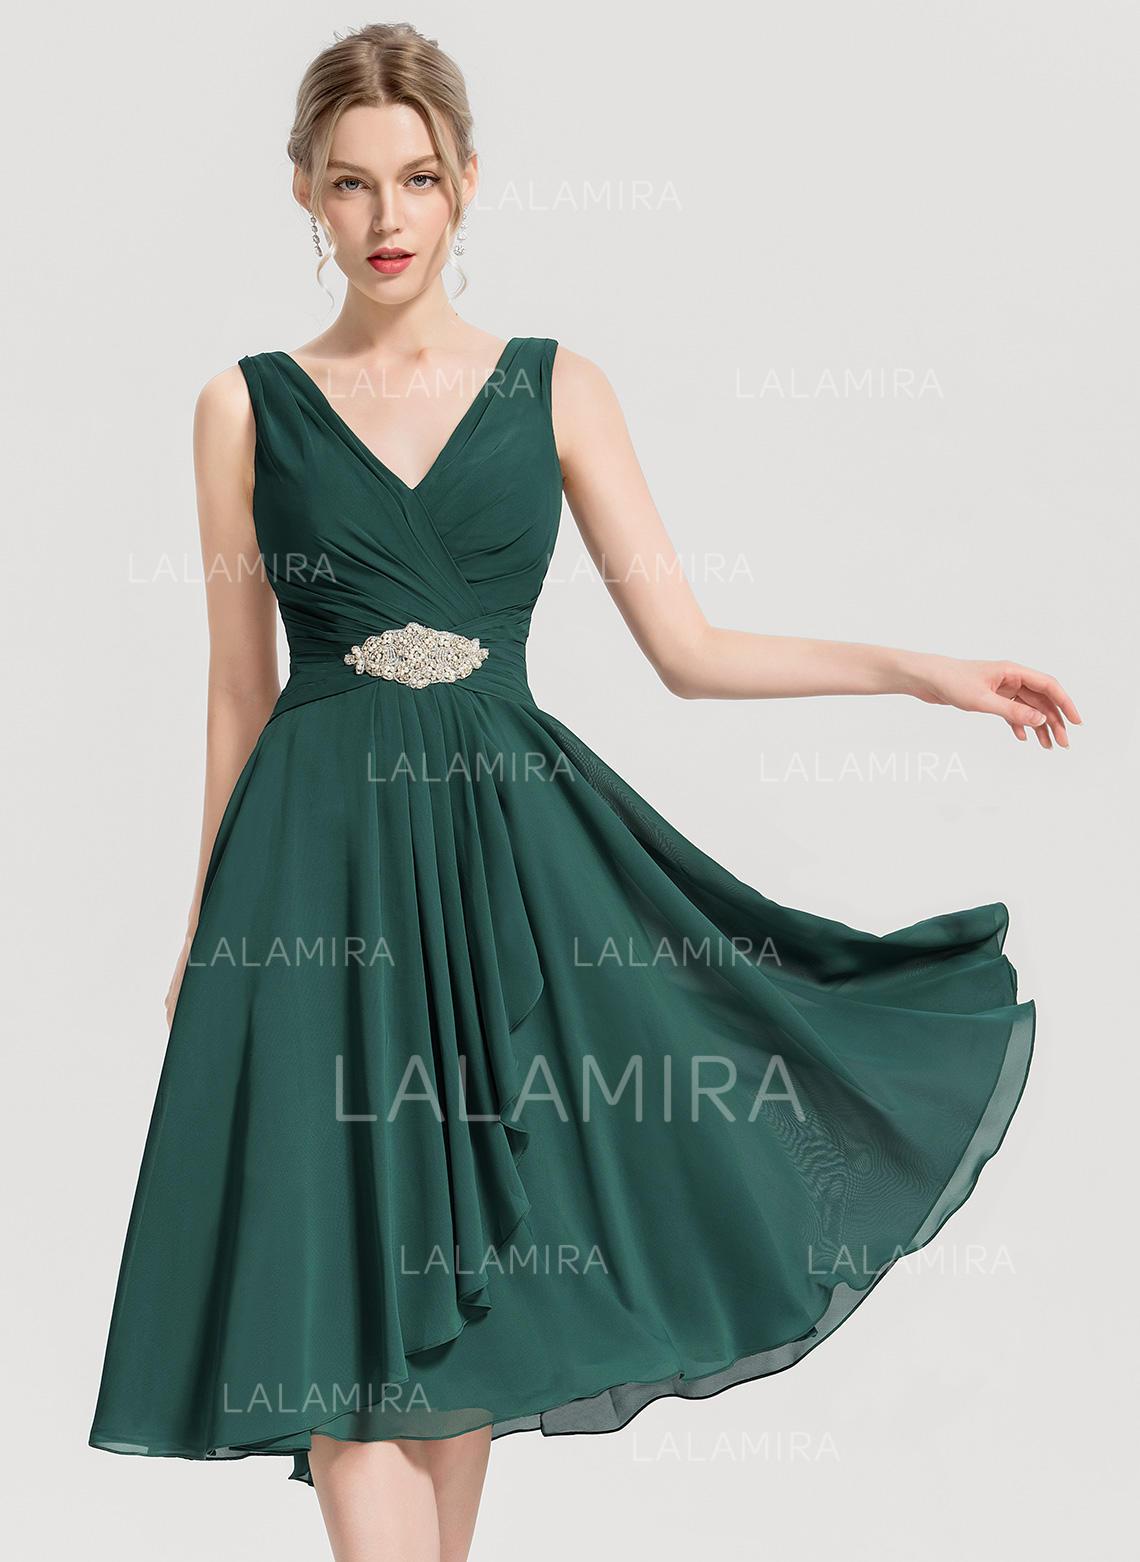 eabdc59fb89 A-Line Princess V-neck Knee-Length Chiffon Homecoming Dress With Beading.  Loading zoom